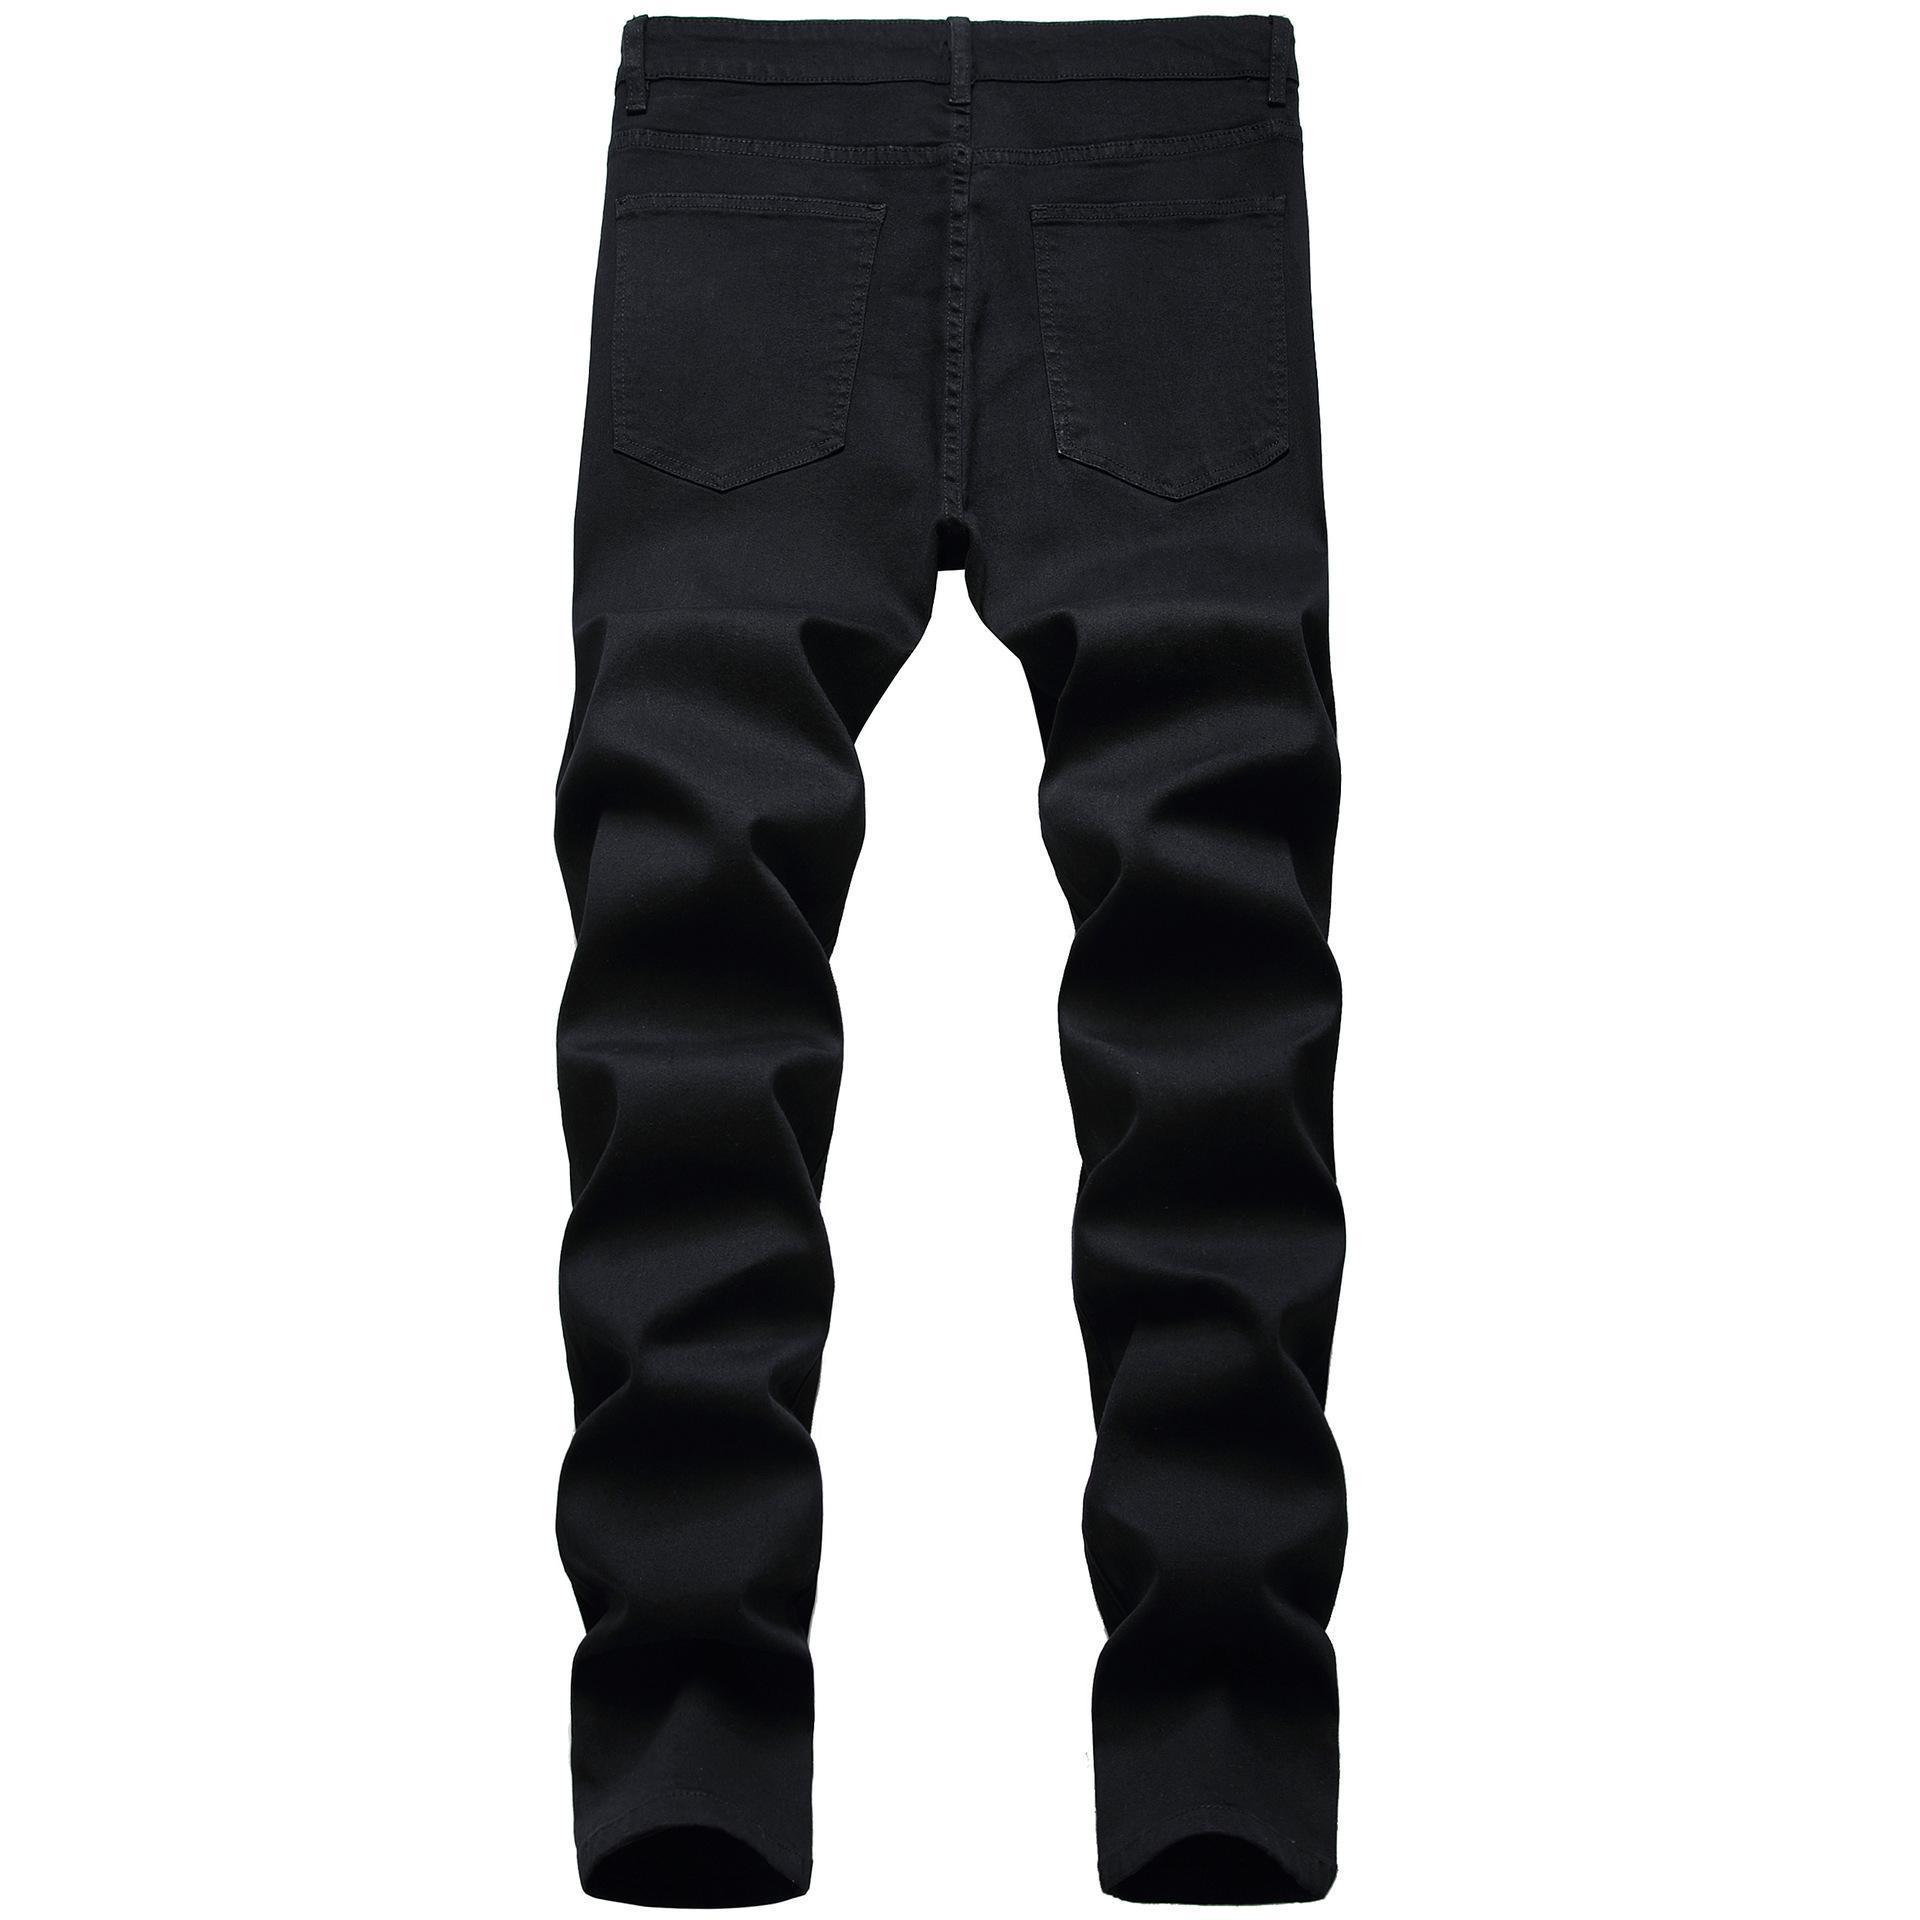 Mens Jean Long Trousers Pencil Denim Pants Street Elastic Black Hole Washed Fashion Casual Fashion Hip Hop Washed Male Pants